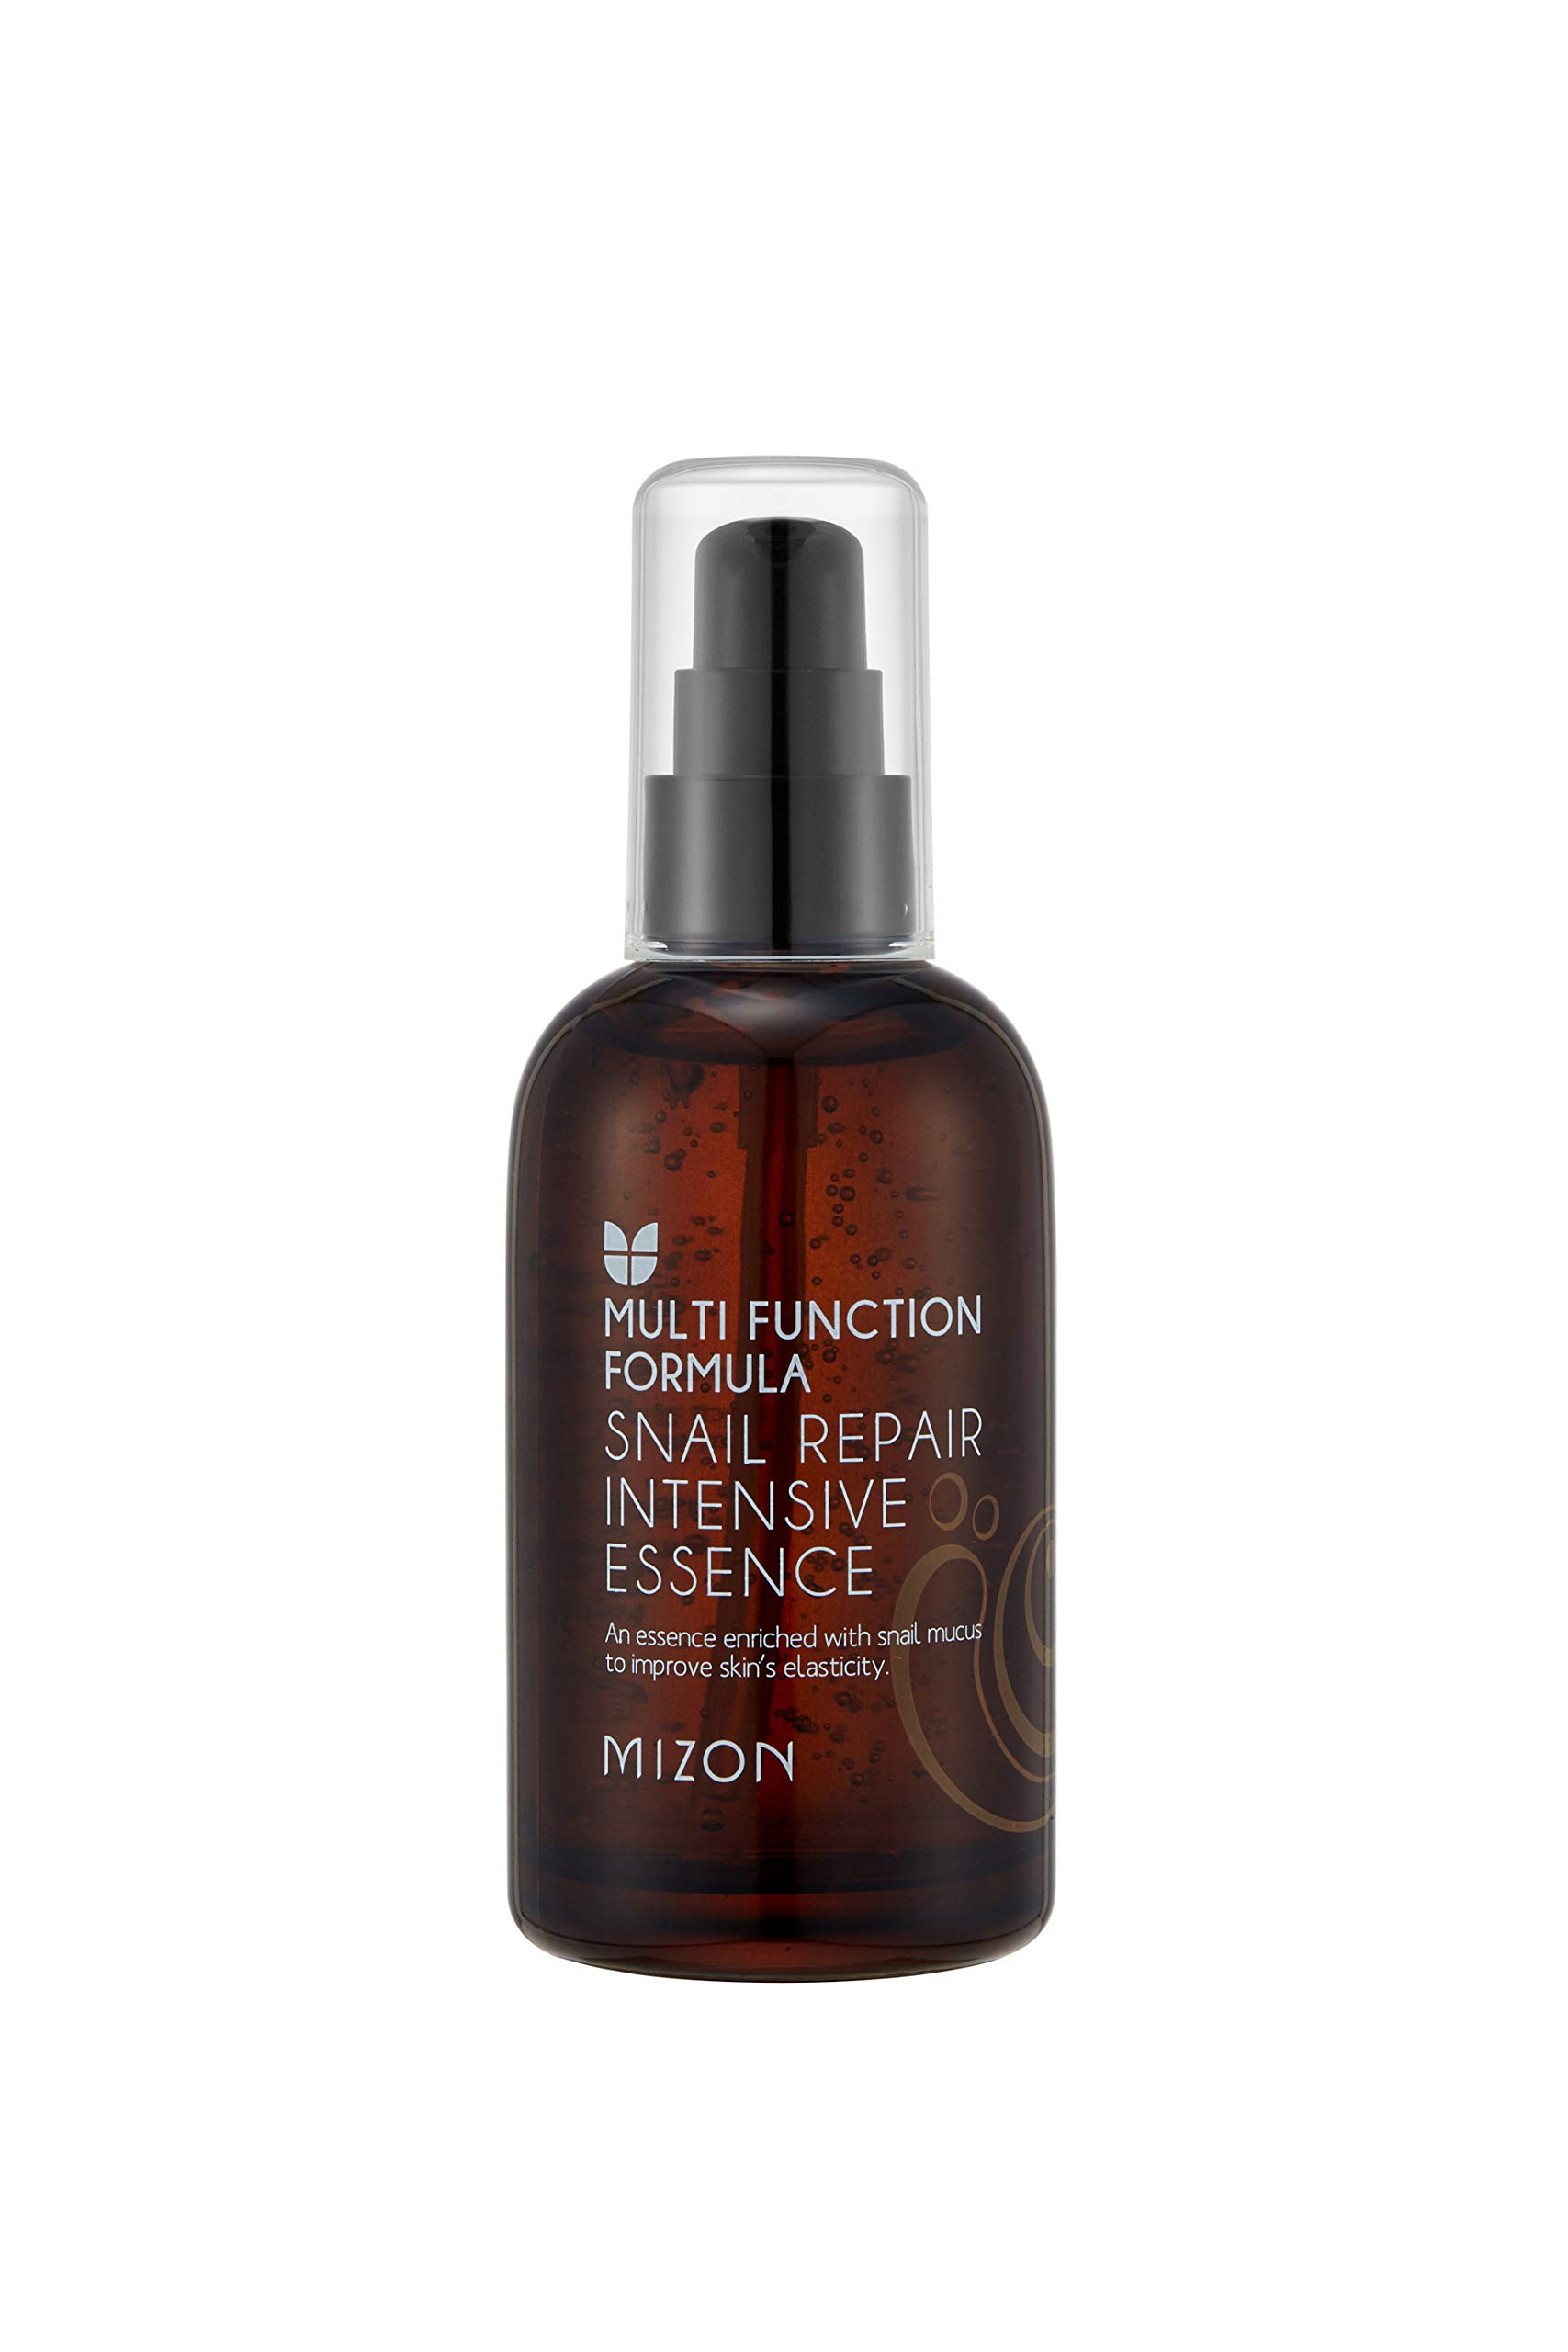 Mizon Snail Repair Intensive Care Line, Snail Facial Essence 3.38 fl oz, Korean Skincare, Improves Skin Tone and Fine Wrinkles, Smooth Skin Texture by MIZON